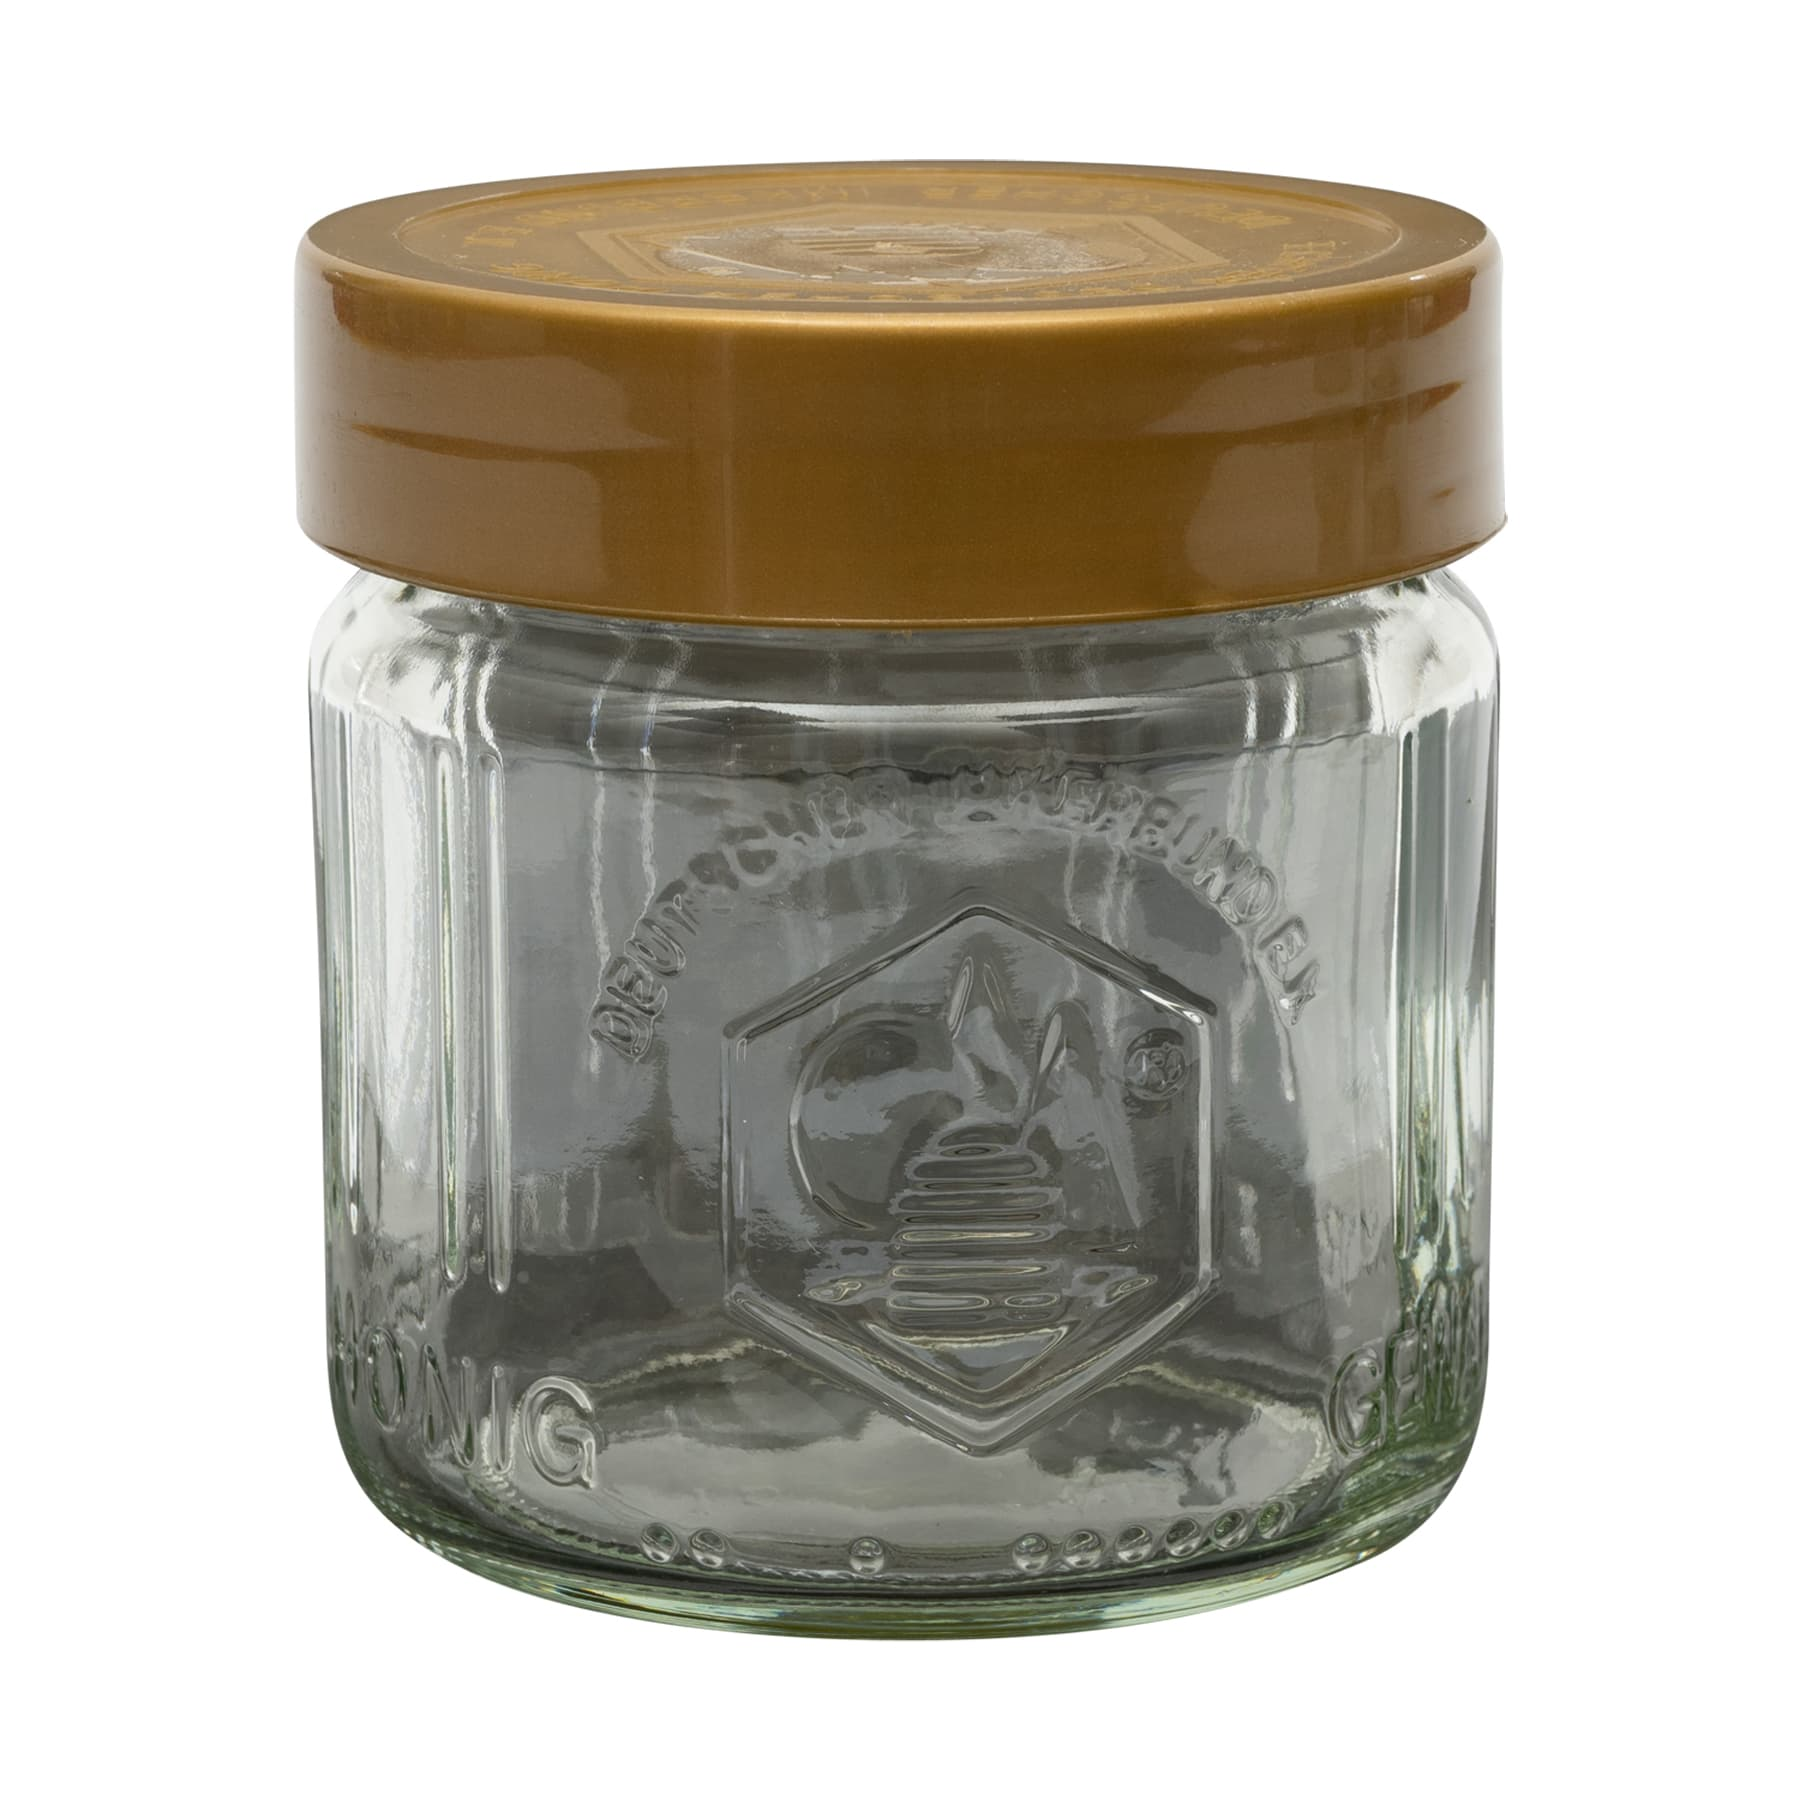 DIB - Glas 250 g in Karton verpackt inkl. Deckel,  wir bieten diese nur nur Selbstabholung an